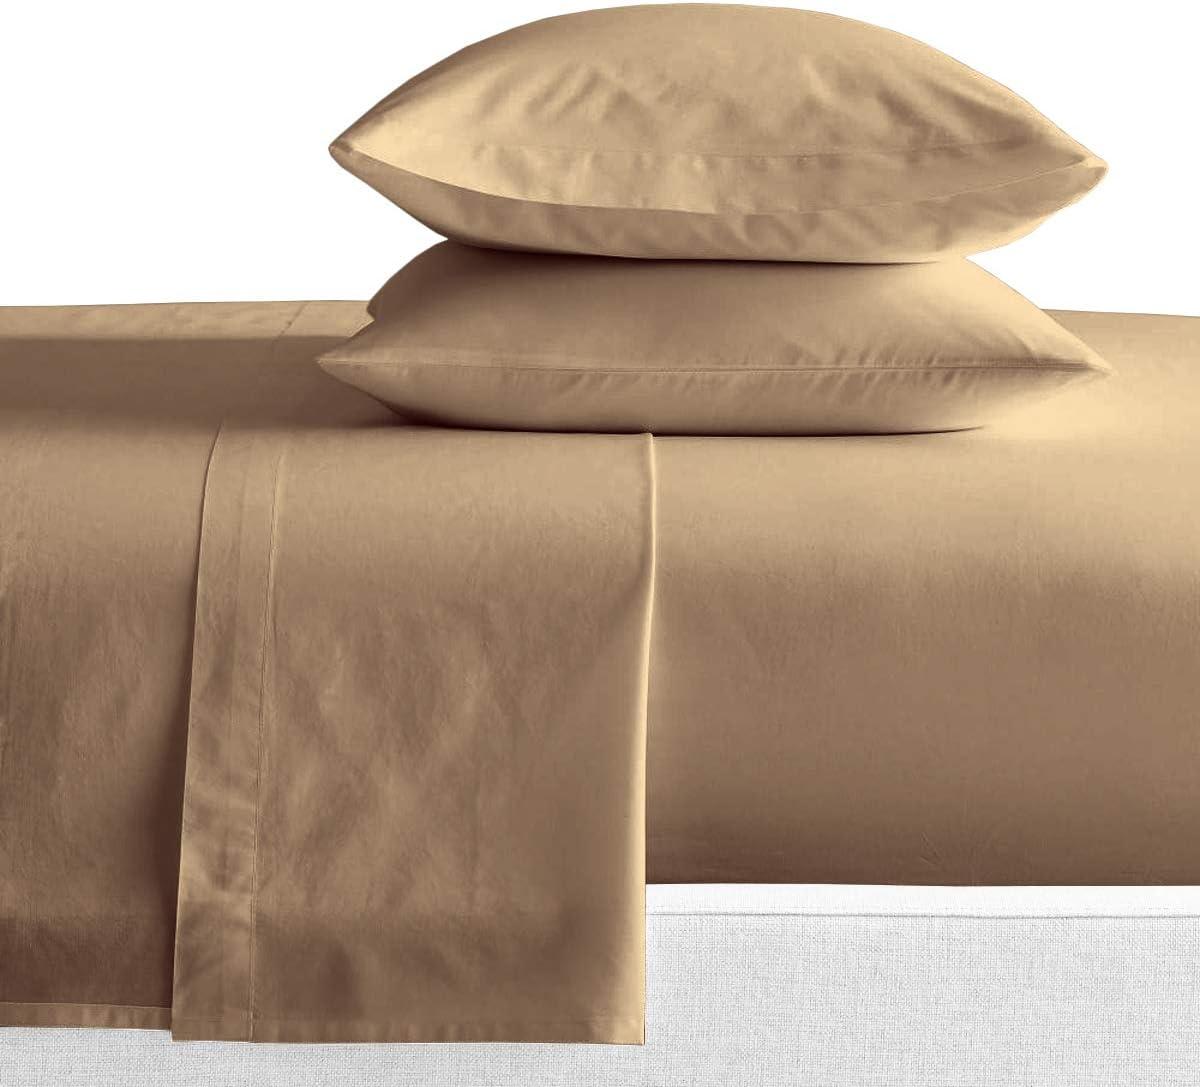 RV King Sheets Luxury Soft 100% Egyptian Cotton - Sheet Set for RV King